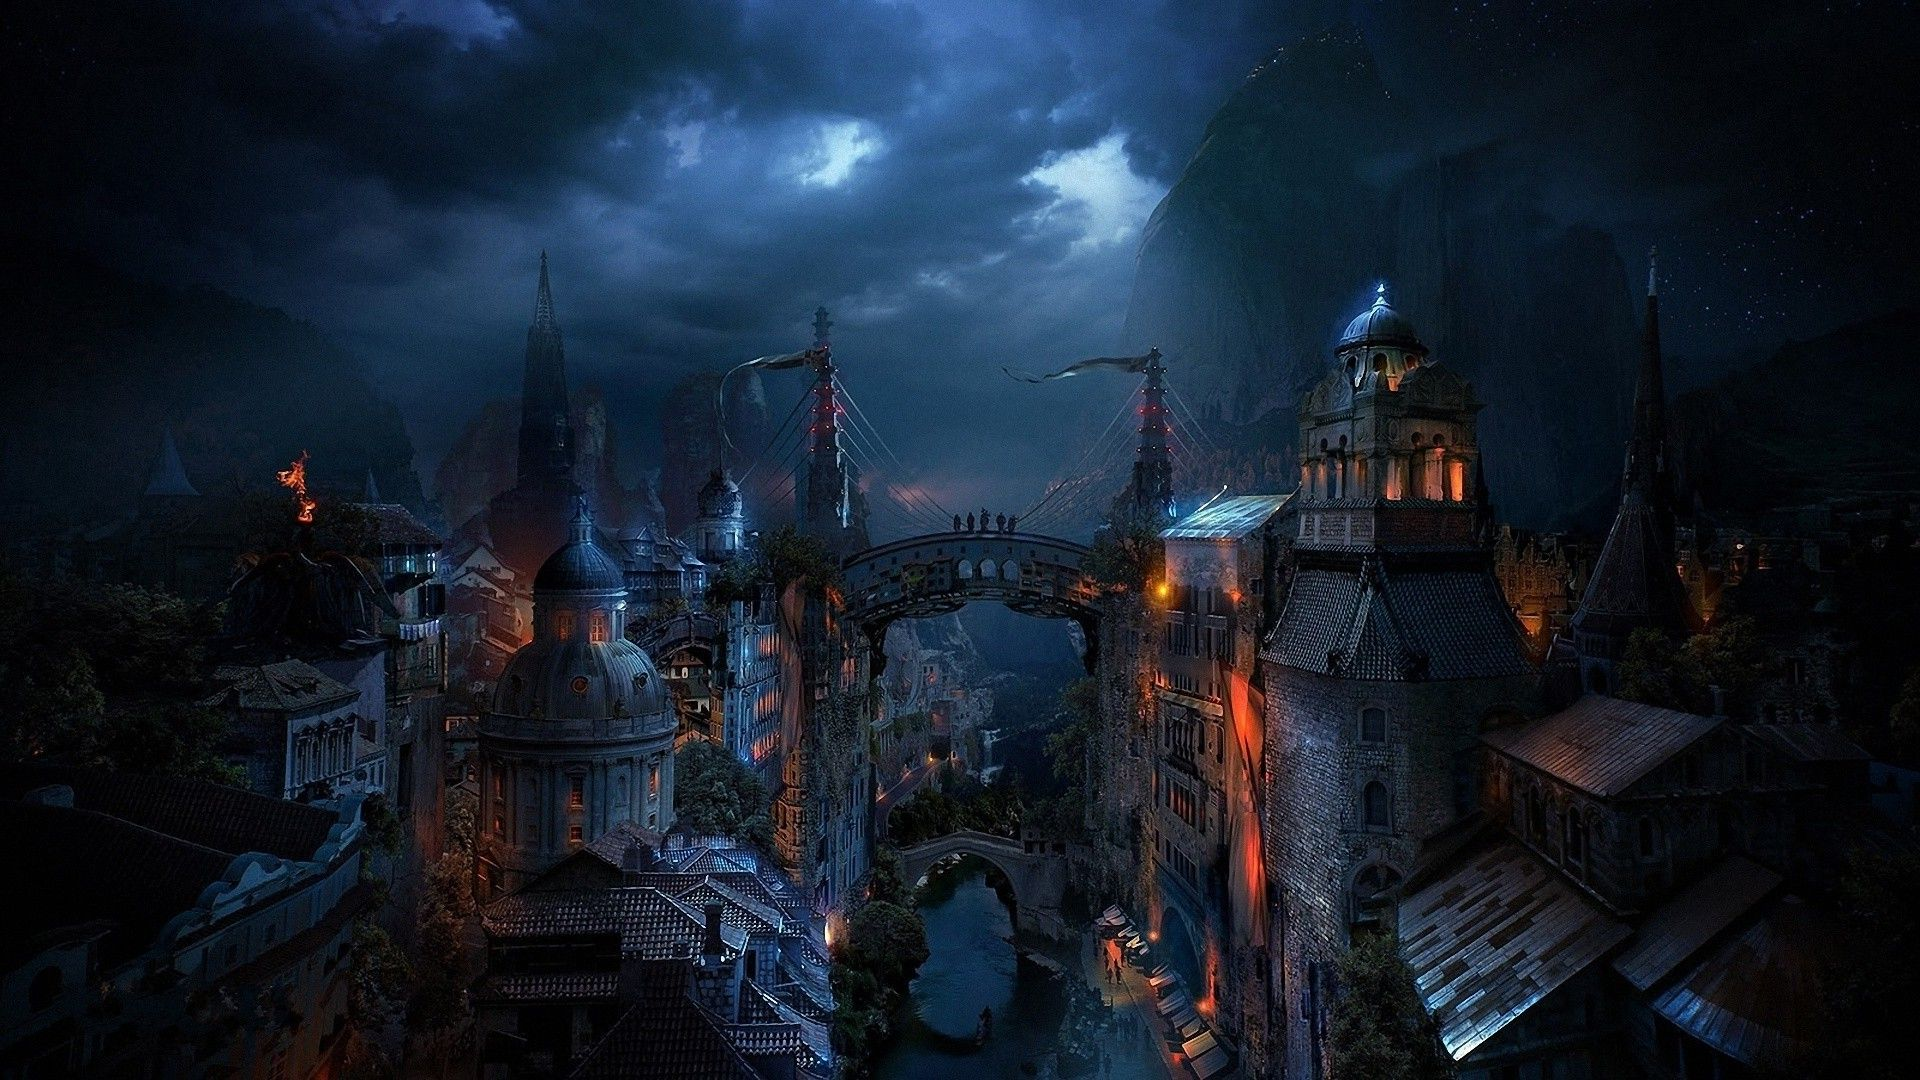 download hd wallpapers of 54733 fantasy art cityscape free rh pinterest com